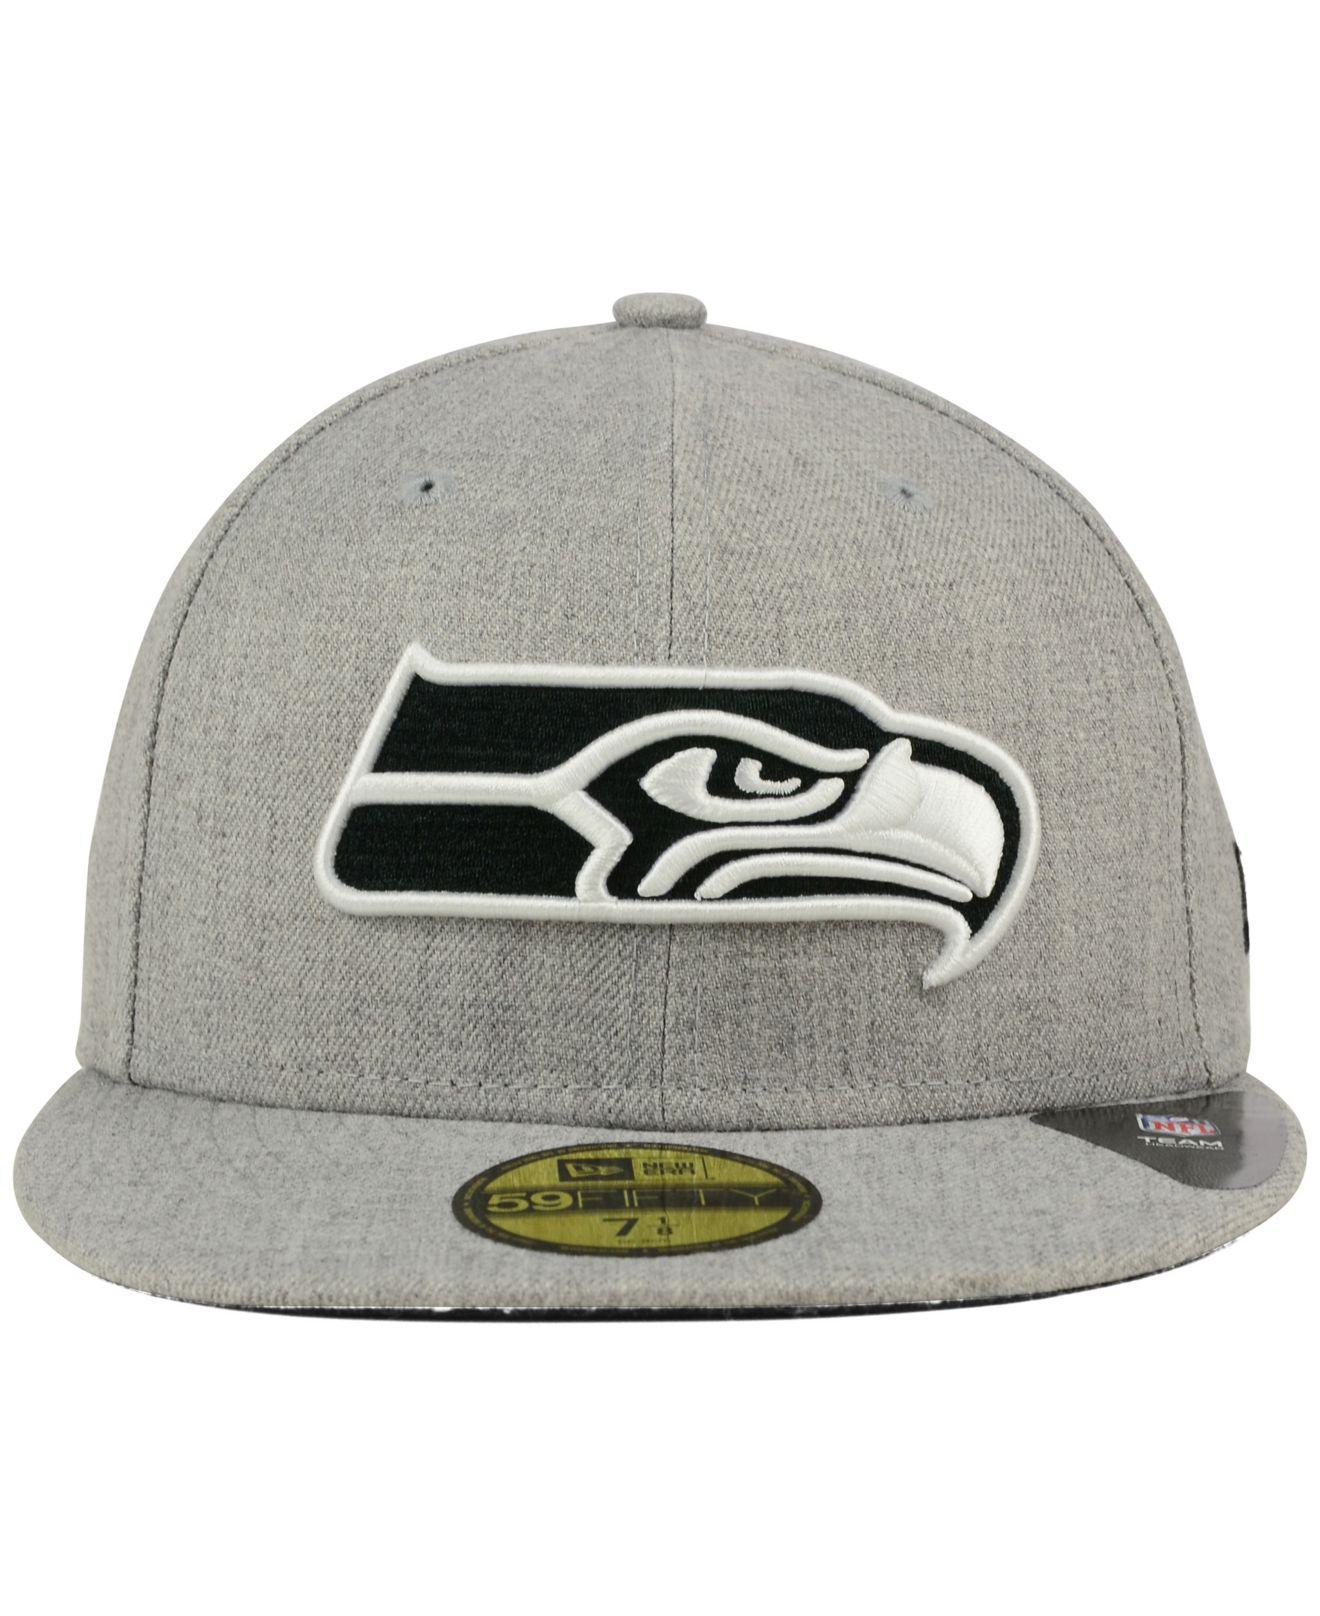 Lyst - KTZ Seattle Seahawks Heather Black White 59fifty Cap in Gray for Men c6e46d42a